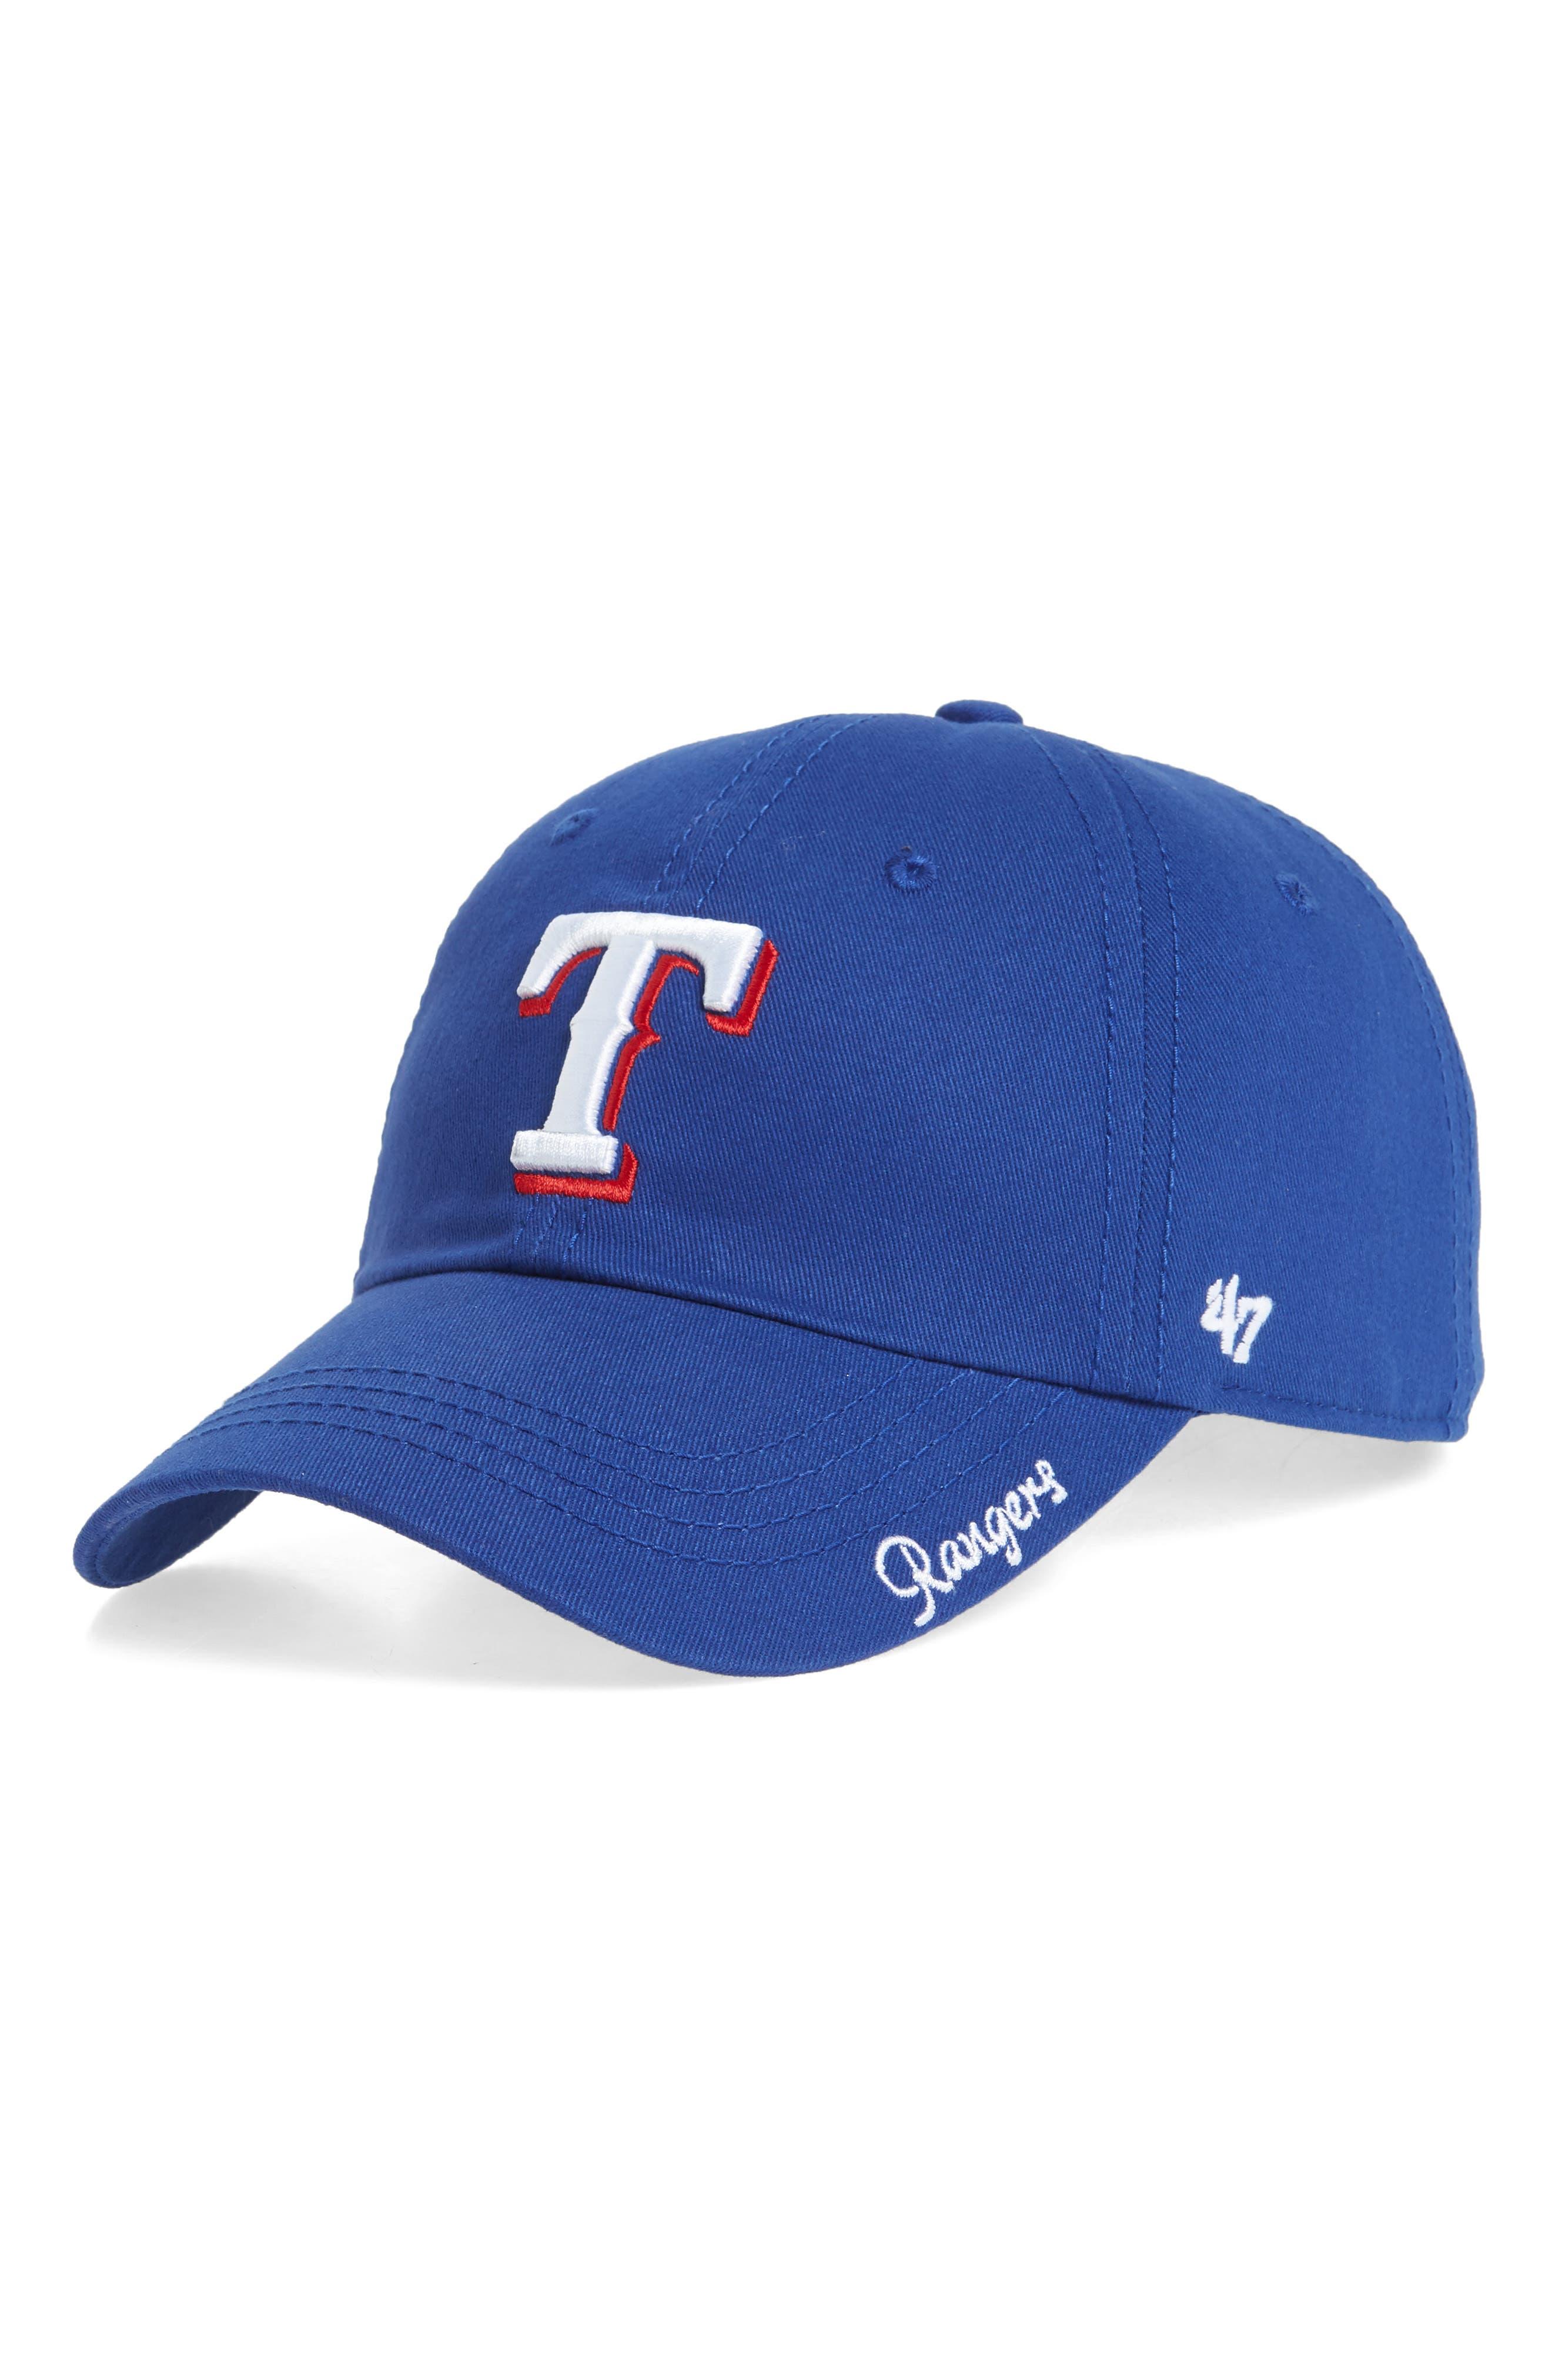 Miata Clean-Up Texas Rangers Baseball Cap,                             Main thumbnail 1, color,                             Royal